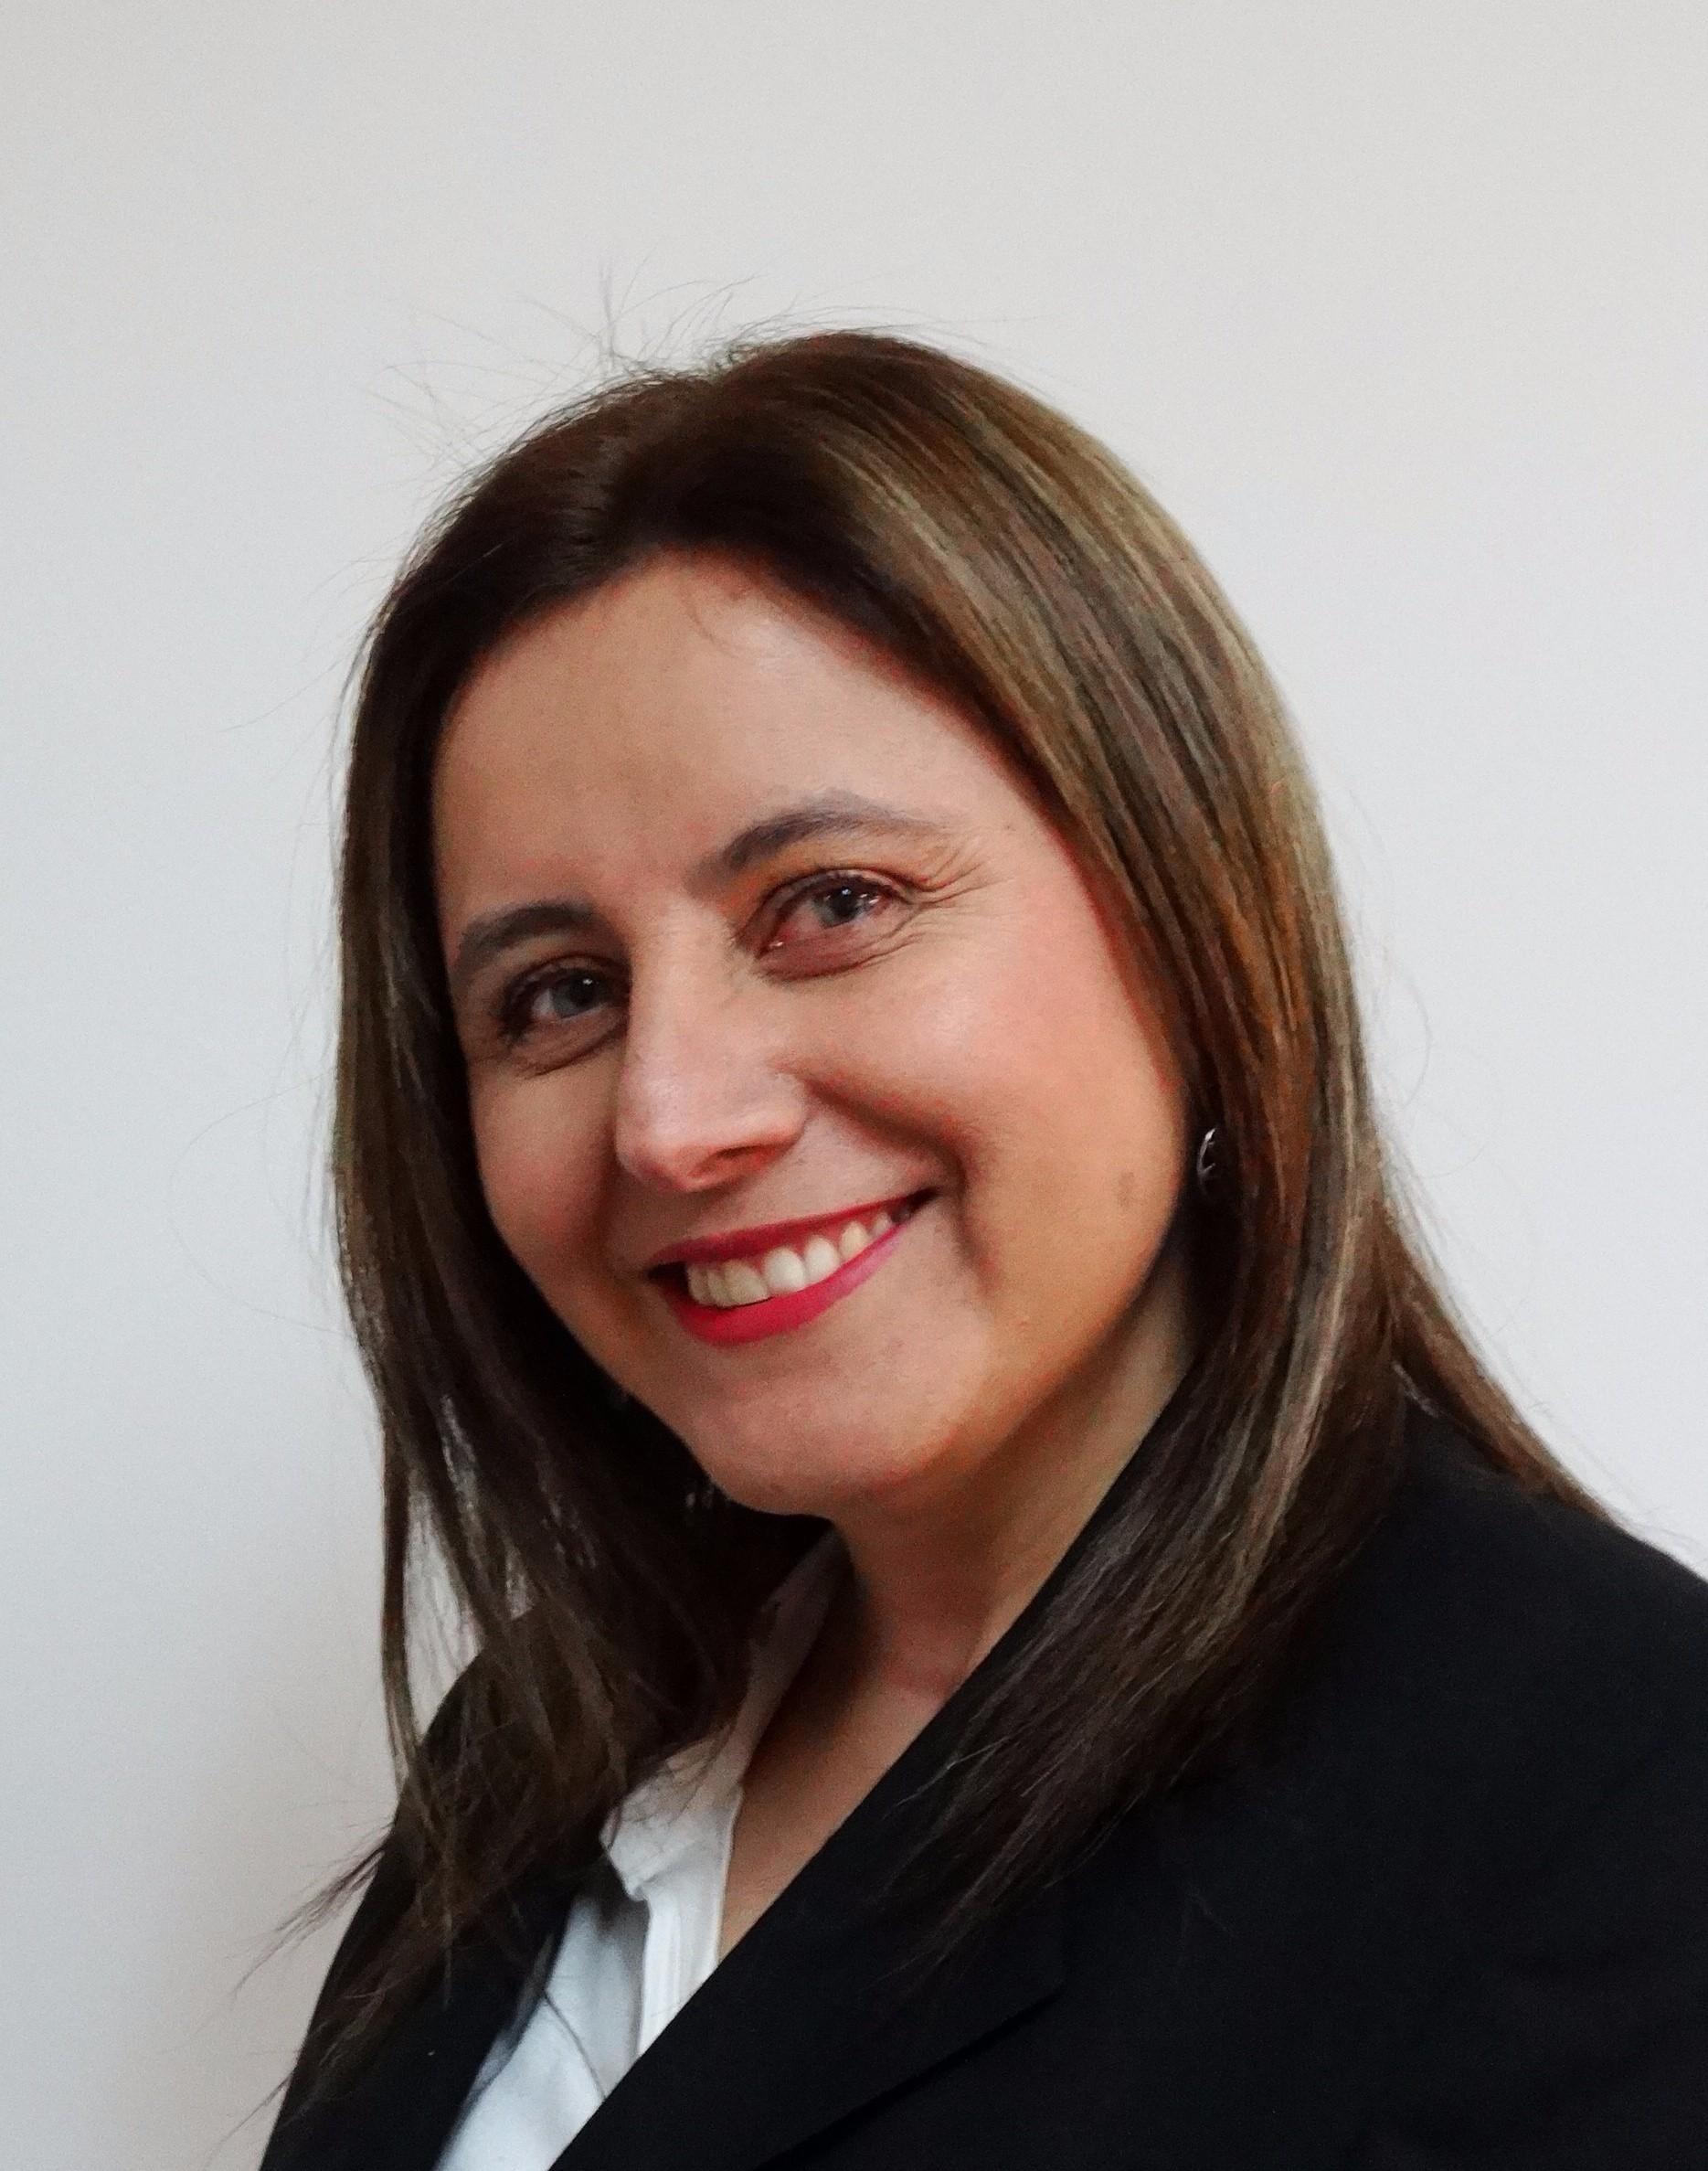 Alejandra Piña